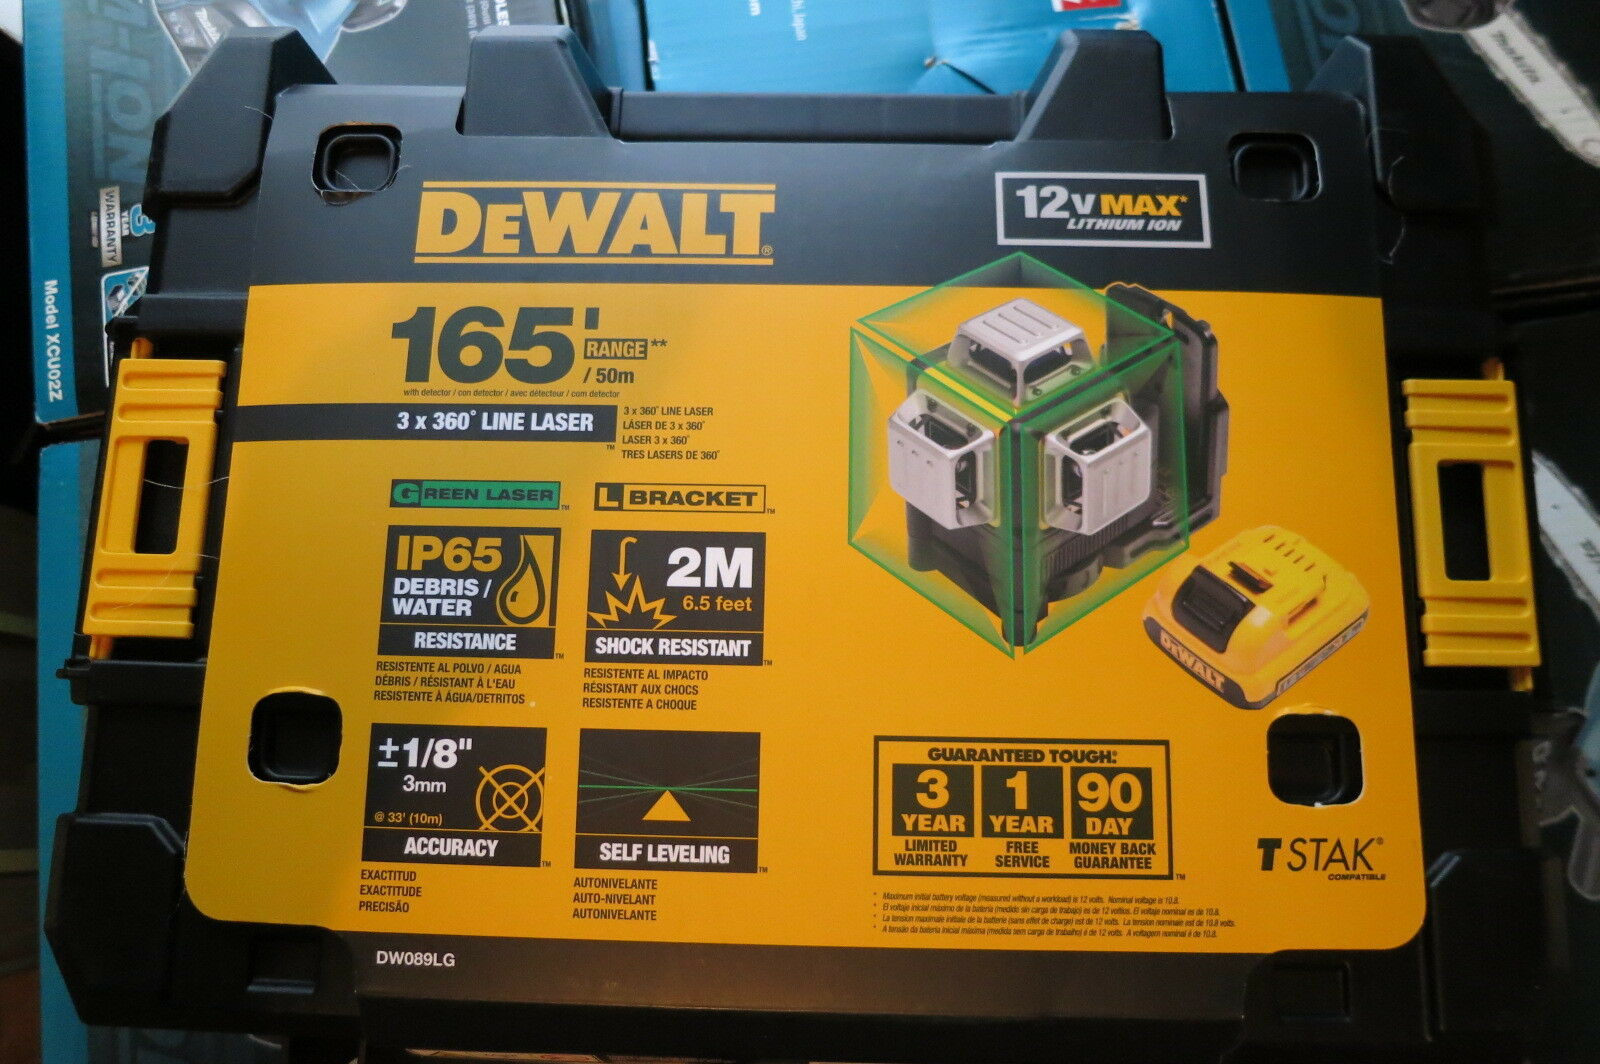 DEWALT DW089LG  12V MAX 3 x 360 Degrees Grün Line Laser DW089LG New